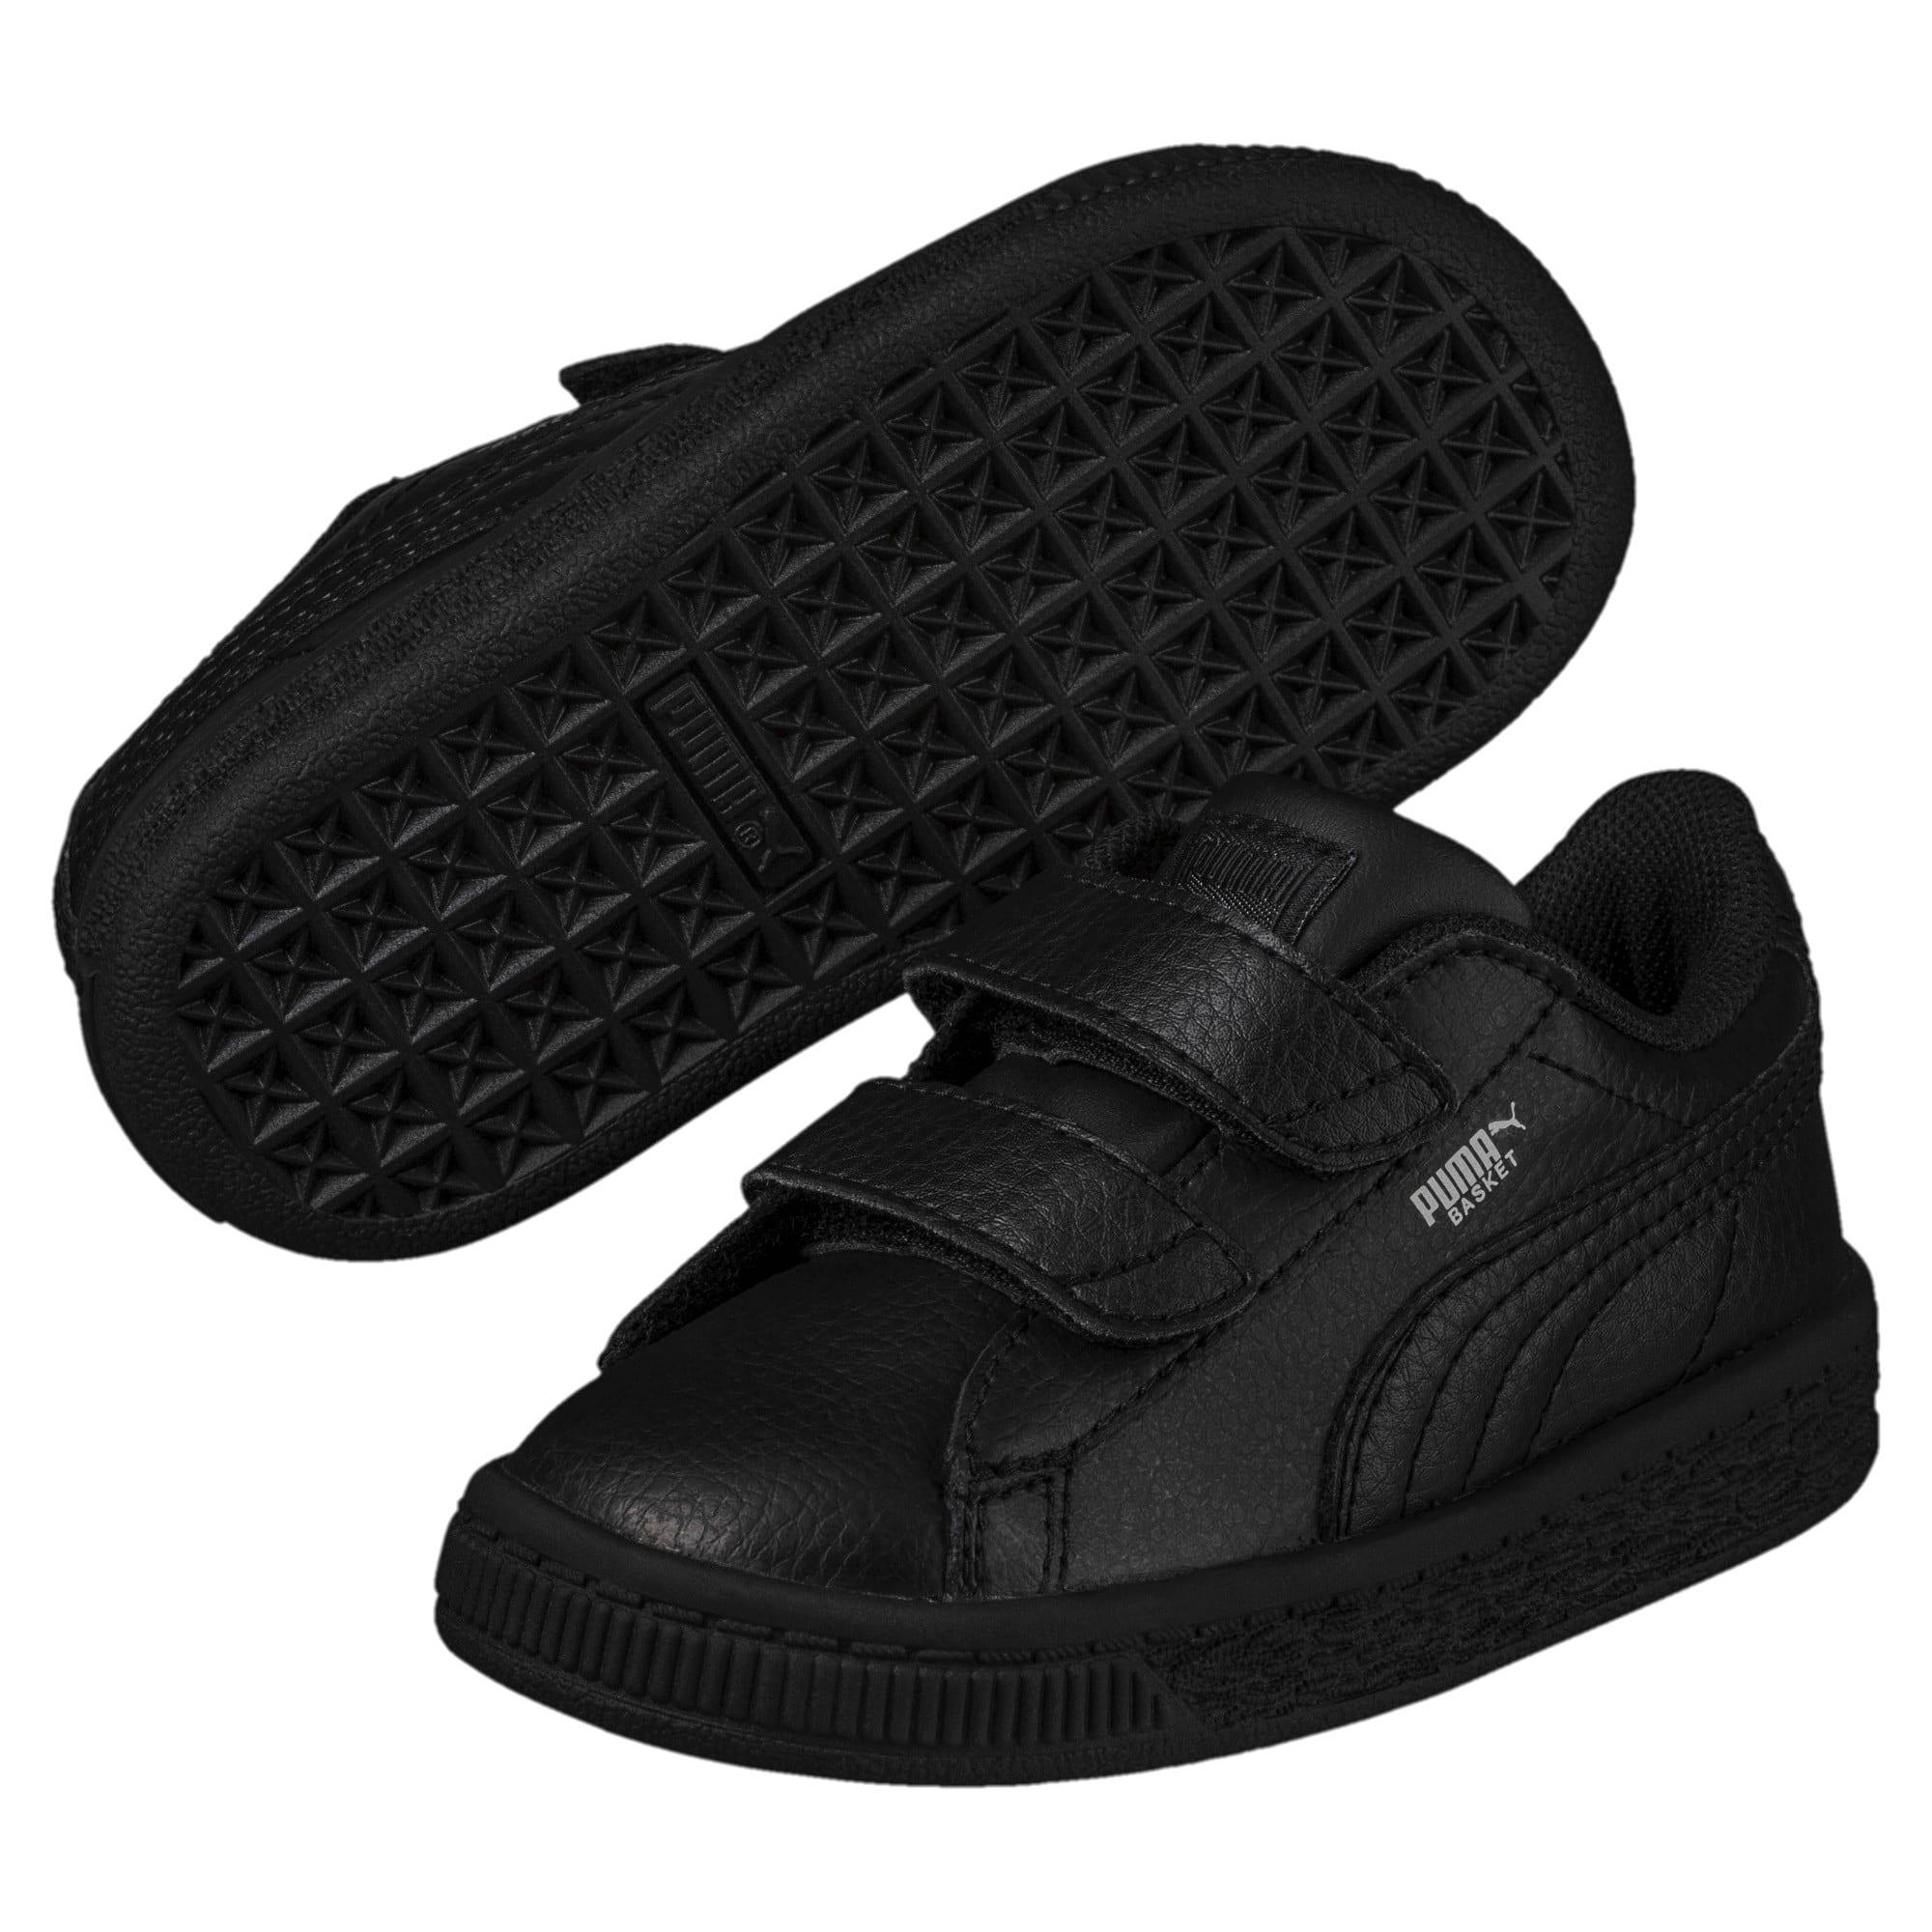 Thumbnail 2 of Basket Classic AC Toddler Shoes, Puma Black-Puma Black, medium